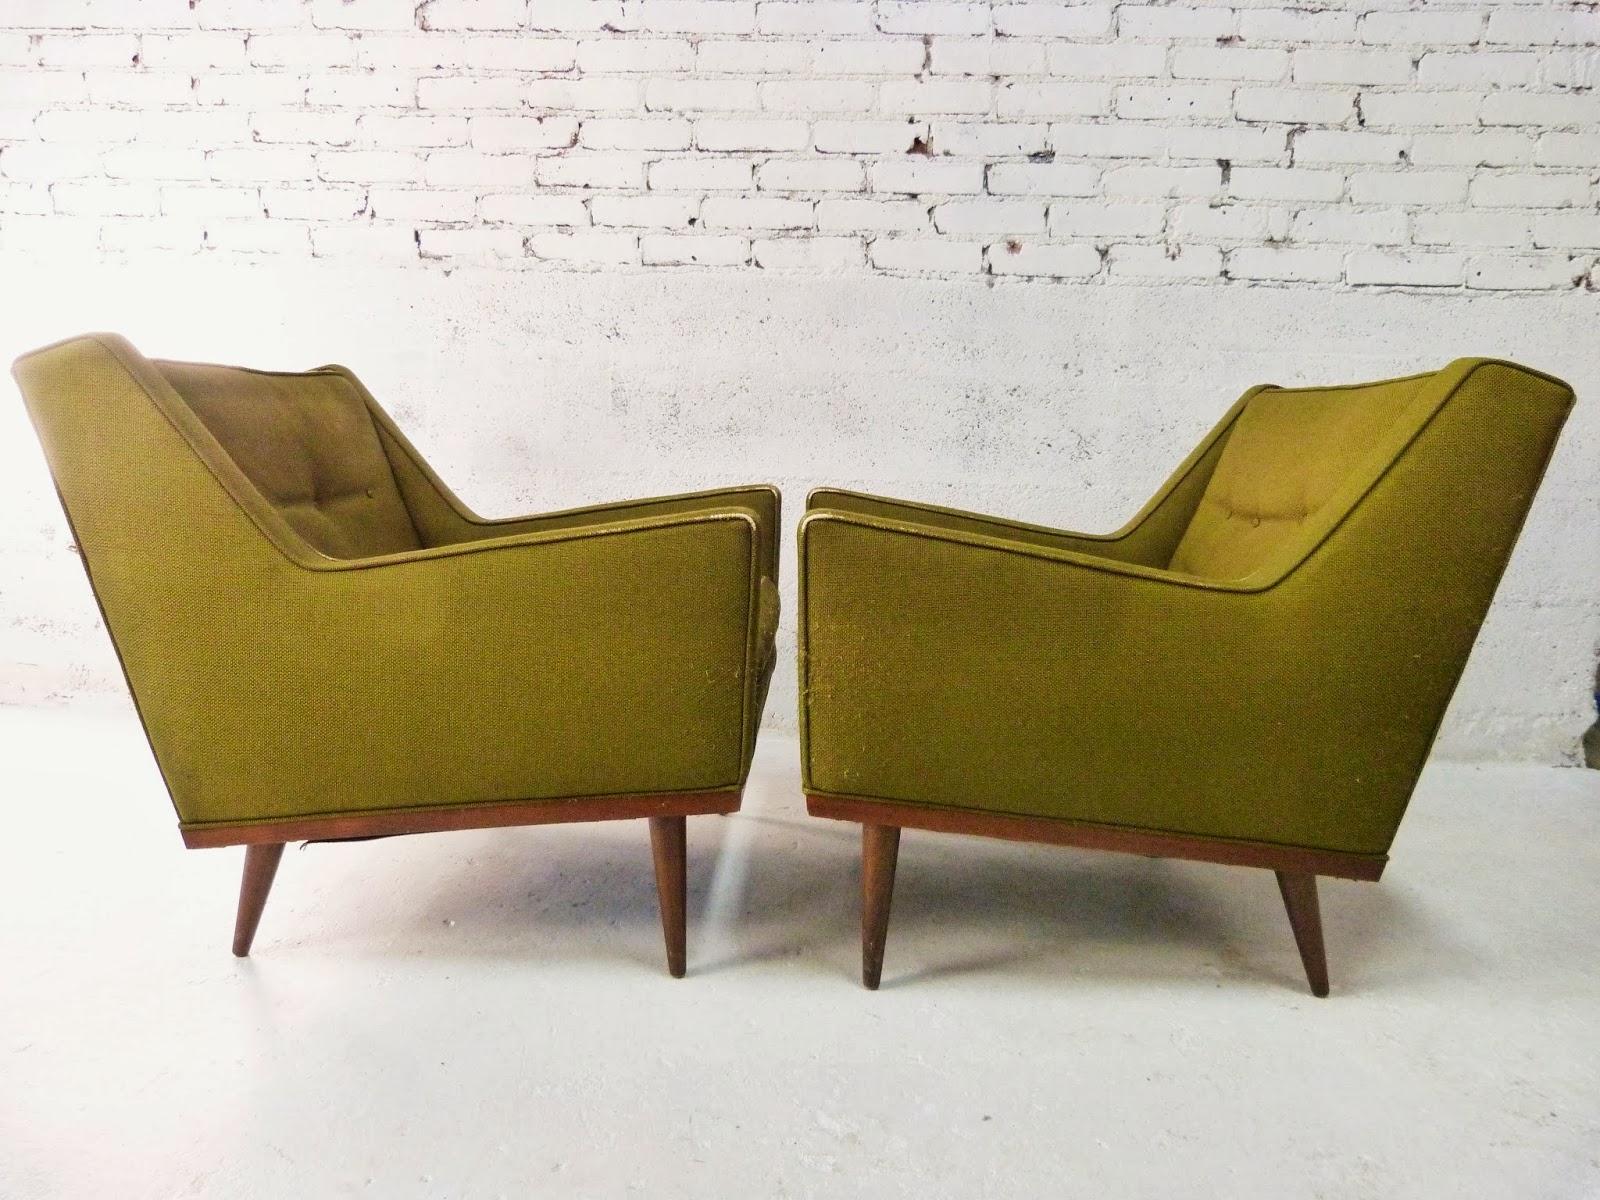 refurbished mid century furniture sets